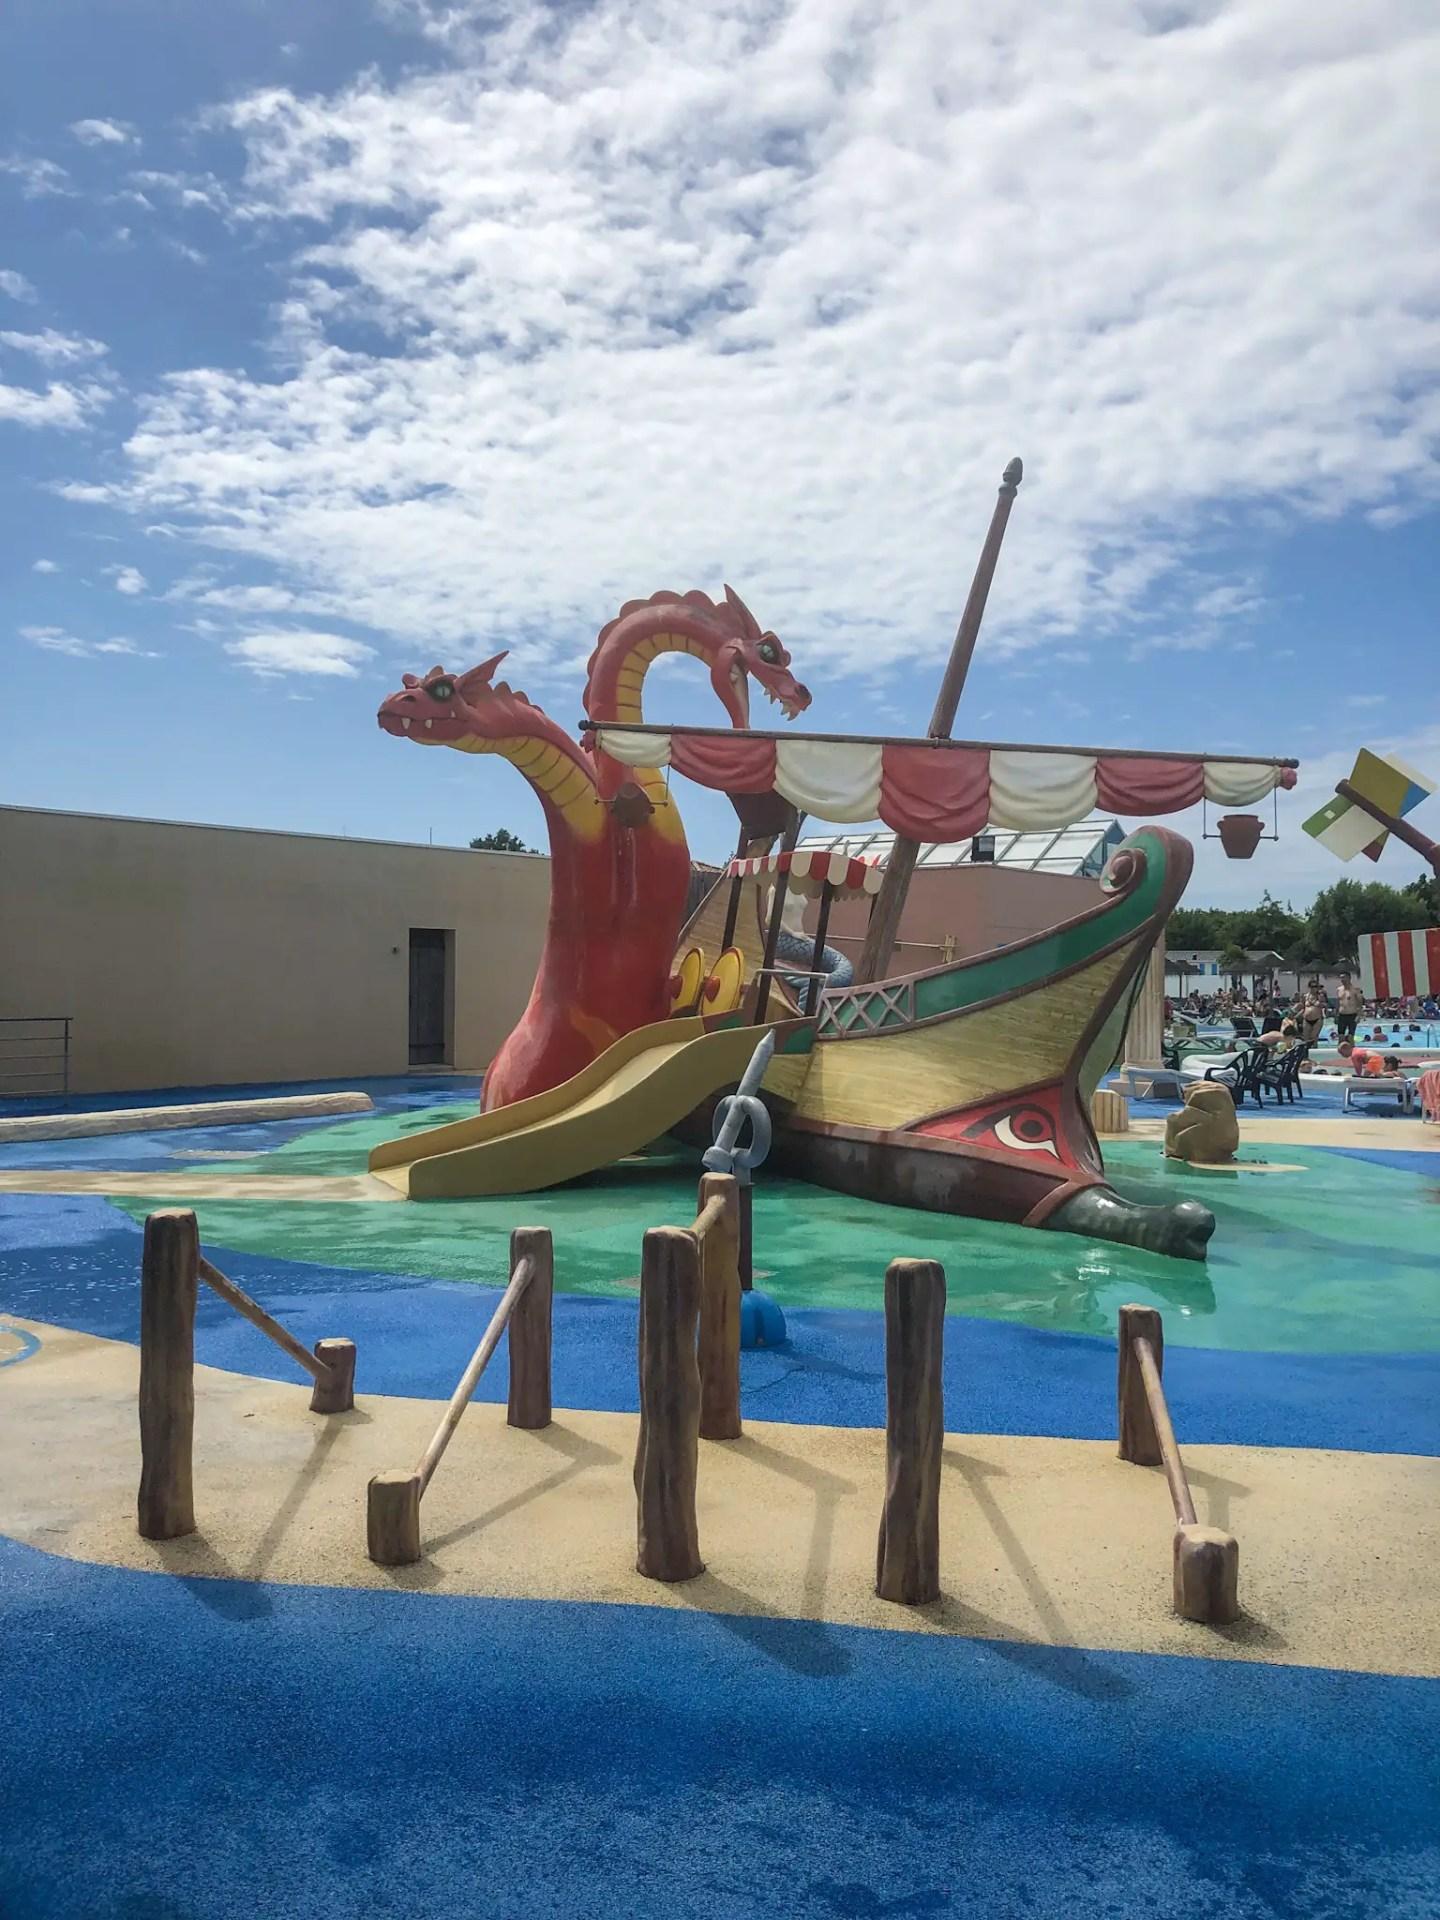 Camping Le Clarys Plage Review  Canvas Holidays. St Jean du monts